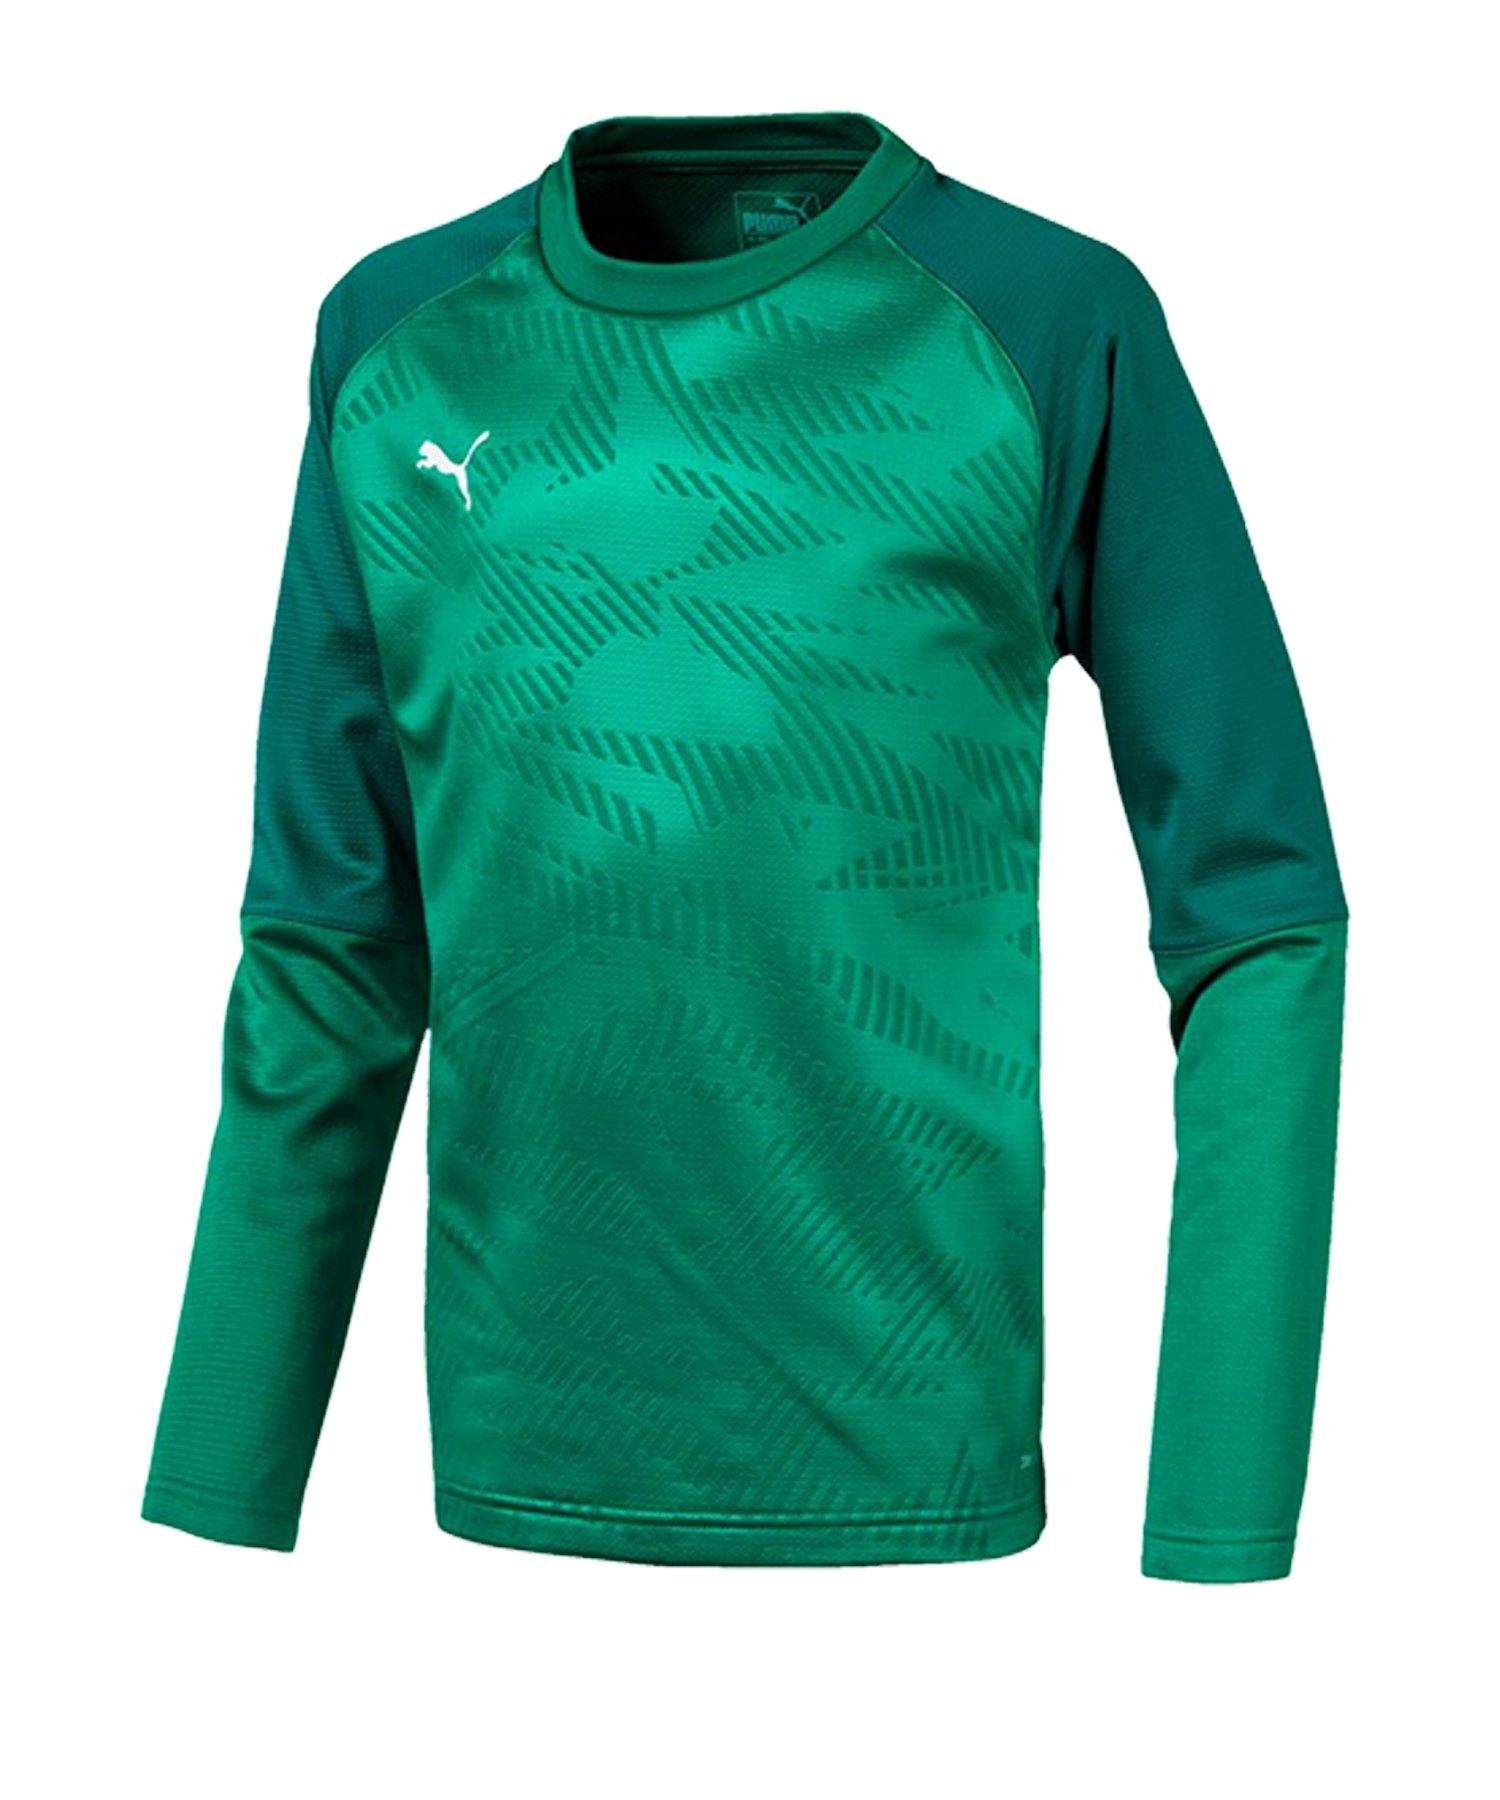 PUMA CUP Training Core Sweatshirt Kids Grün F05 - gruen